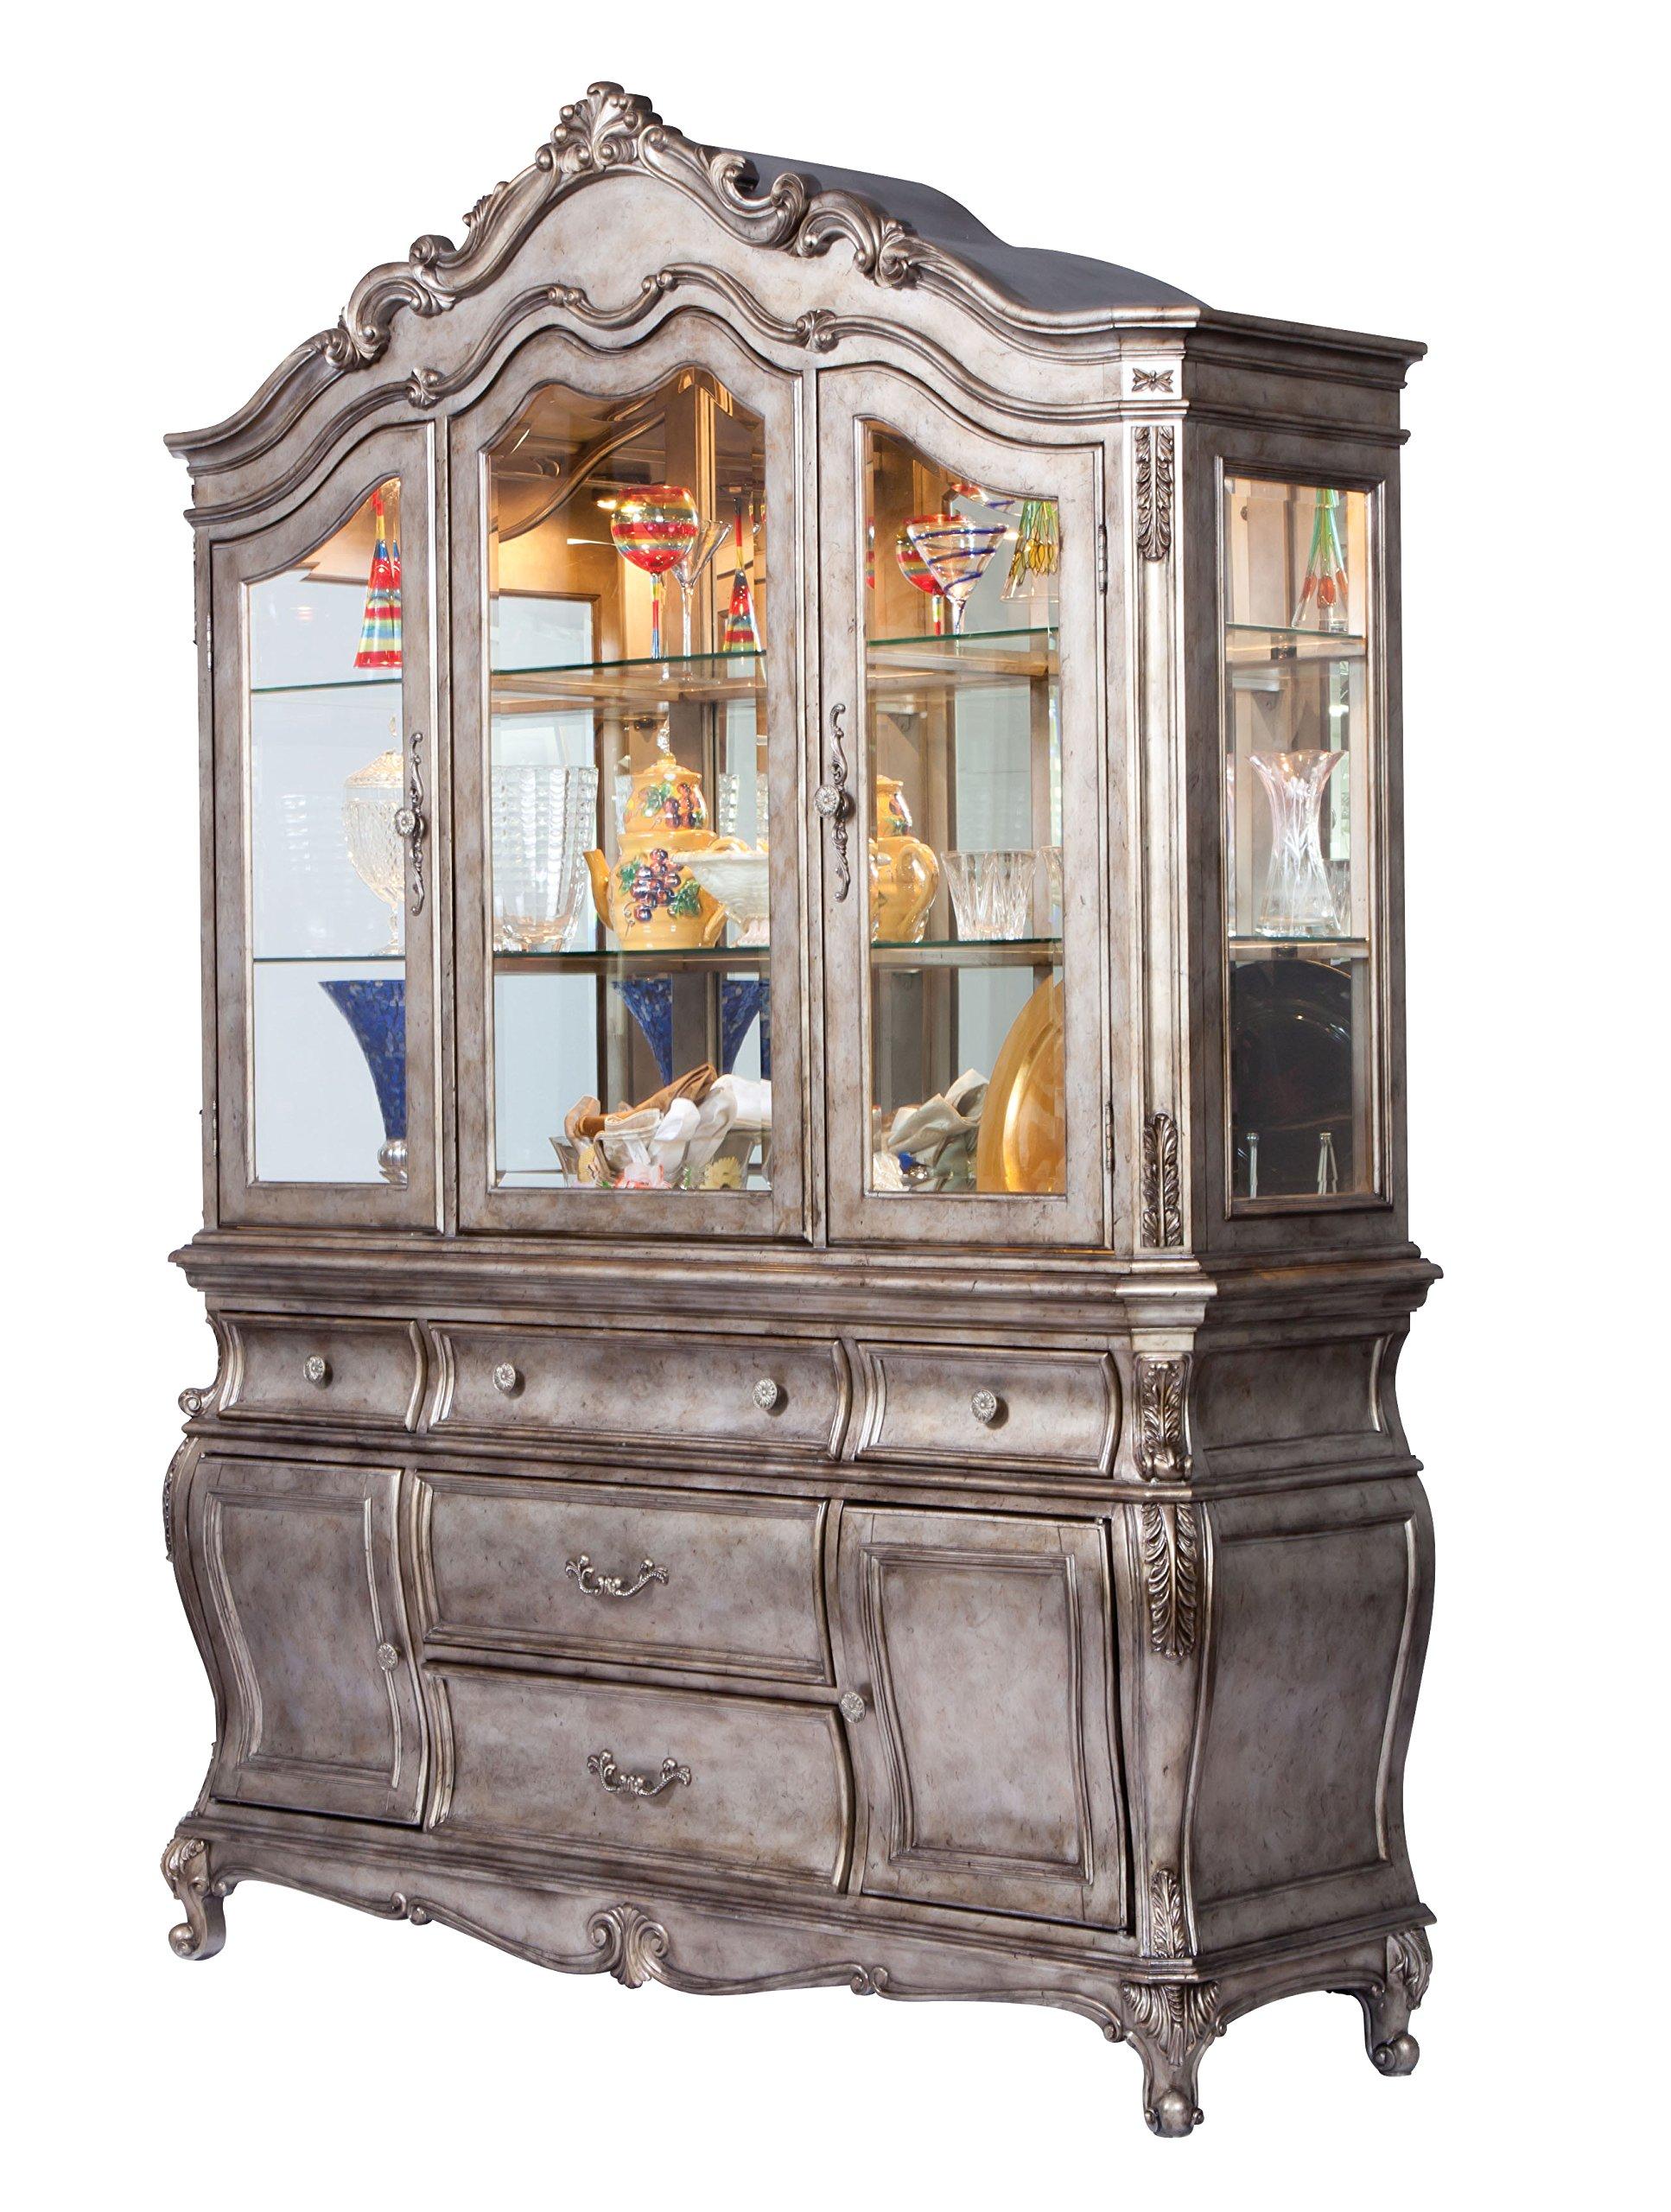 ACME Chantelle Antique Platinum Hutch Buffet by Acme Furniture